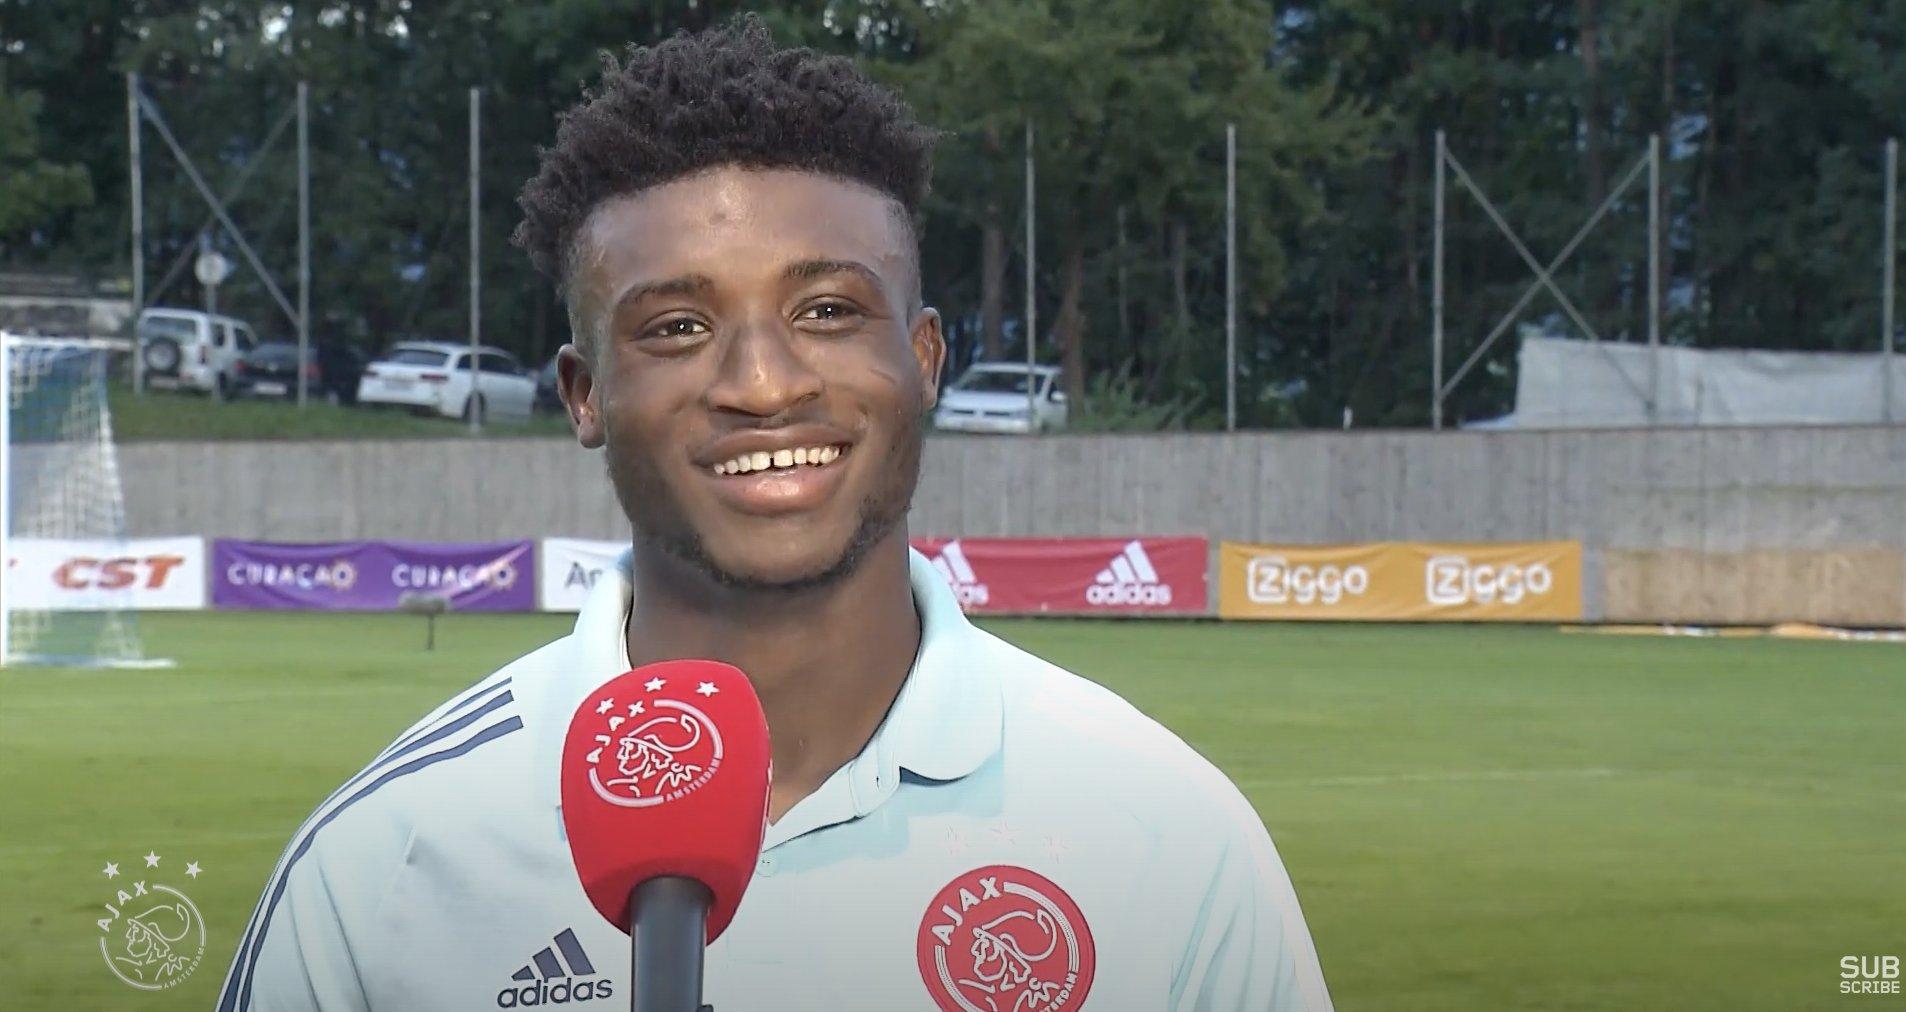 Ghana sensation Mohammed Kudus misses out on 40-man shortlist for the 2020 Golden Boy Award